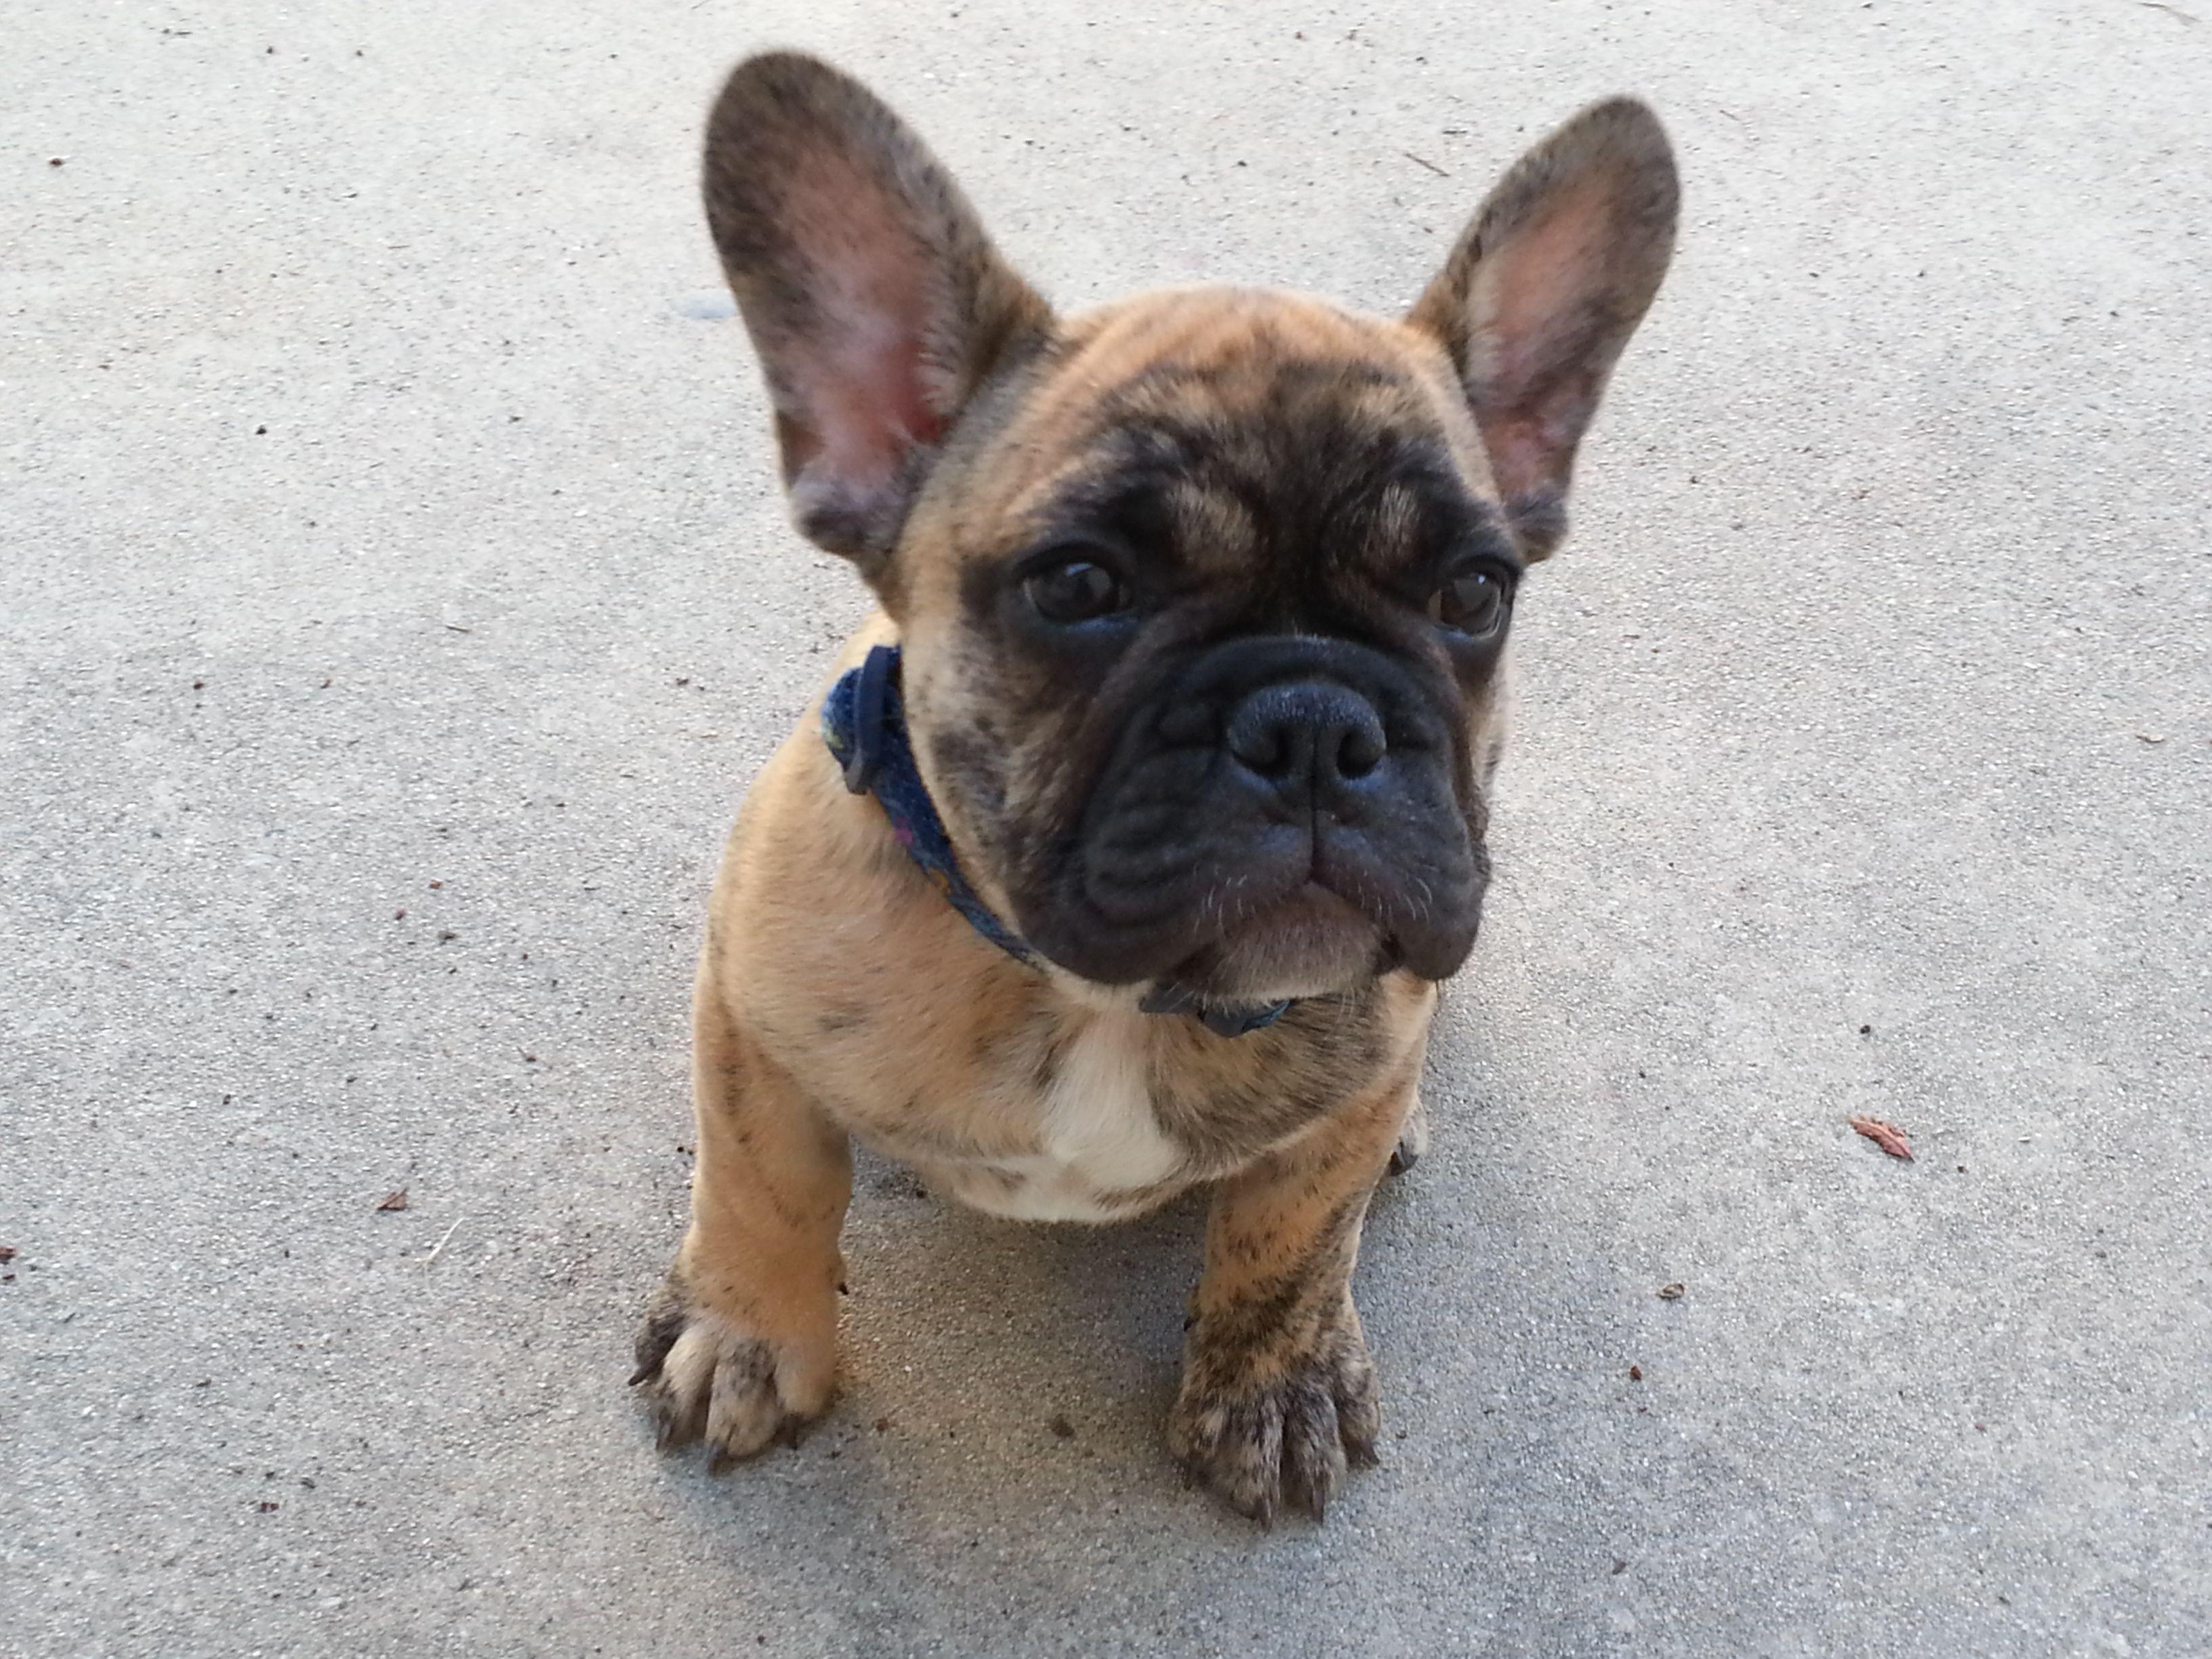 Elvis Oberon Huckabone At 11 Weeks Old French Bulldog French Bulldog Puppy Cute Animals